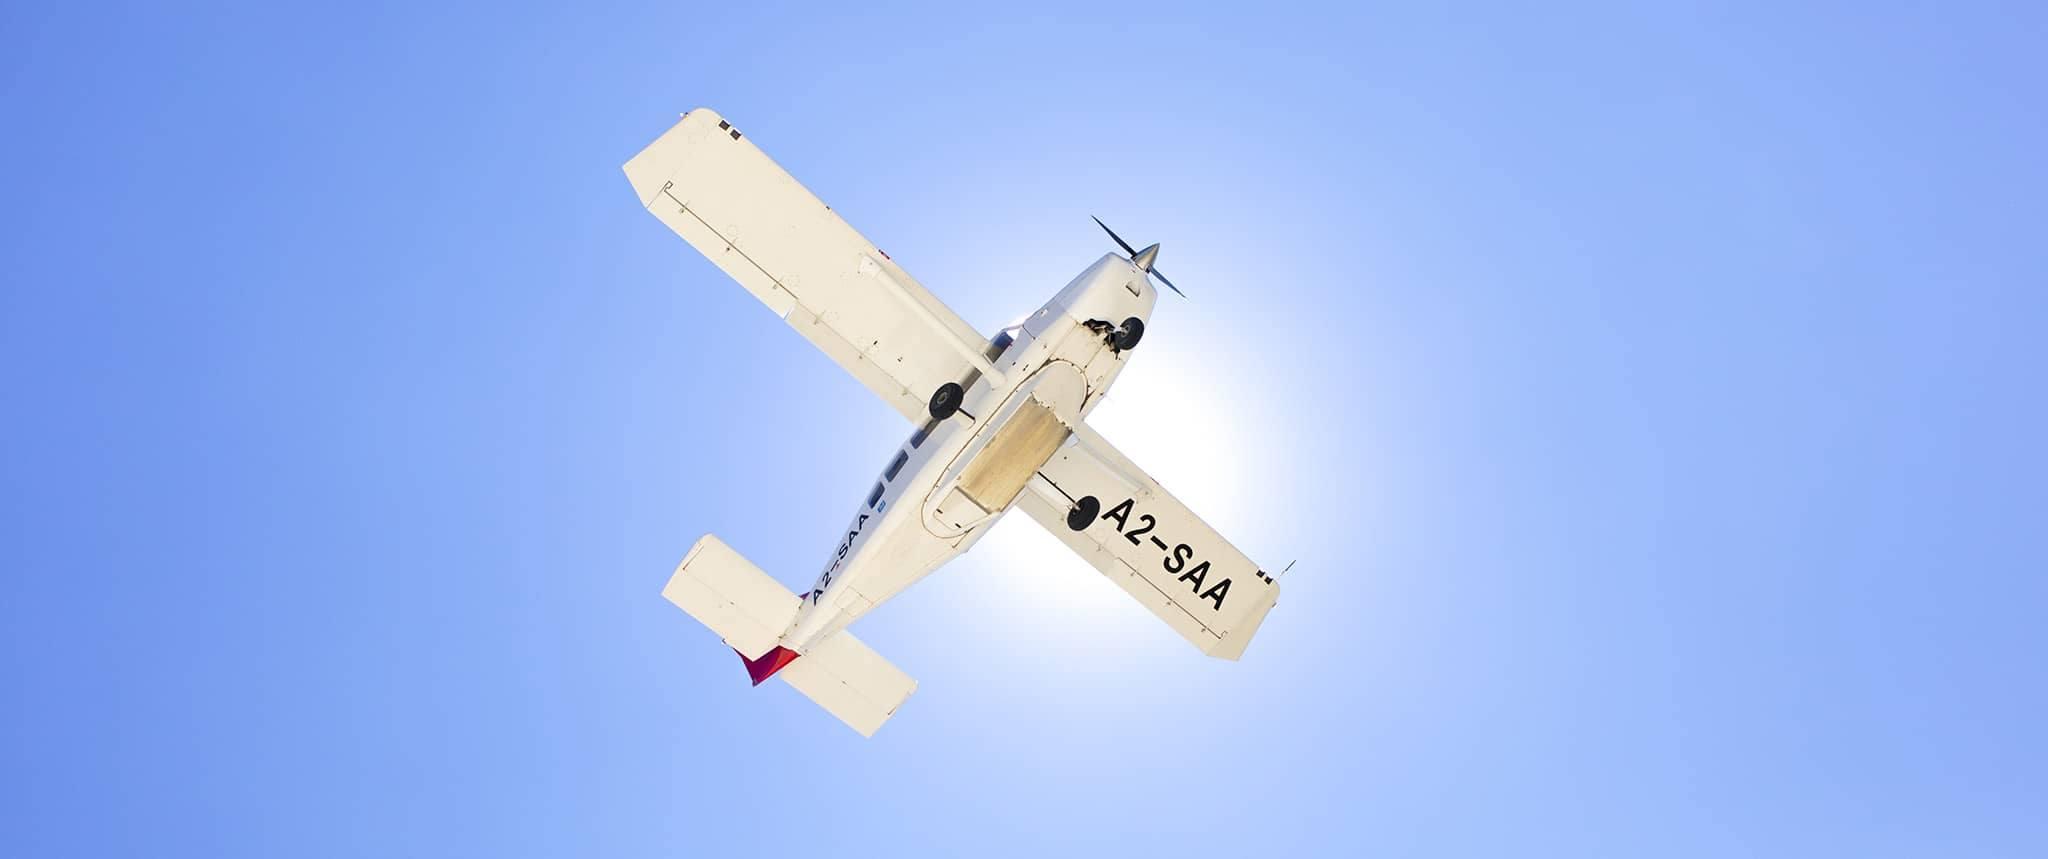 Botswana Moremi Okavango Delta airplane flying sunny